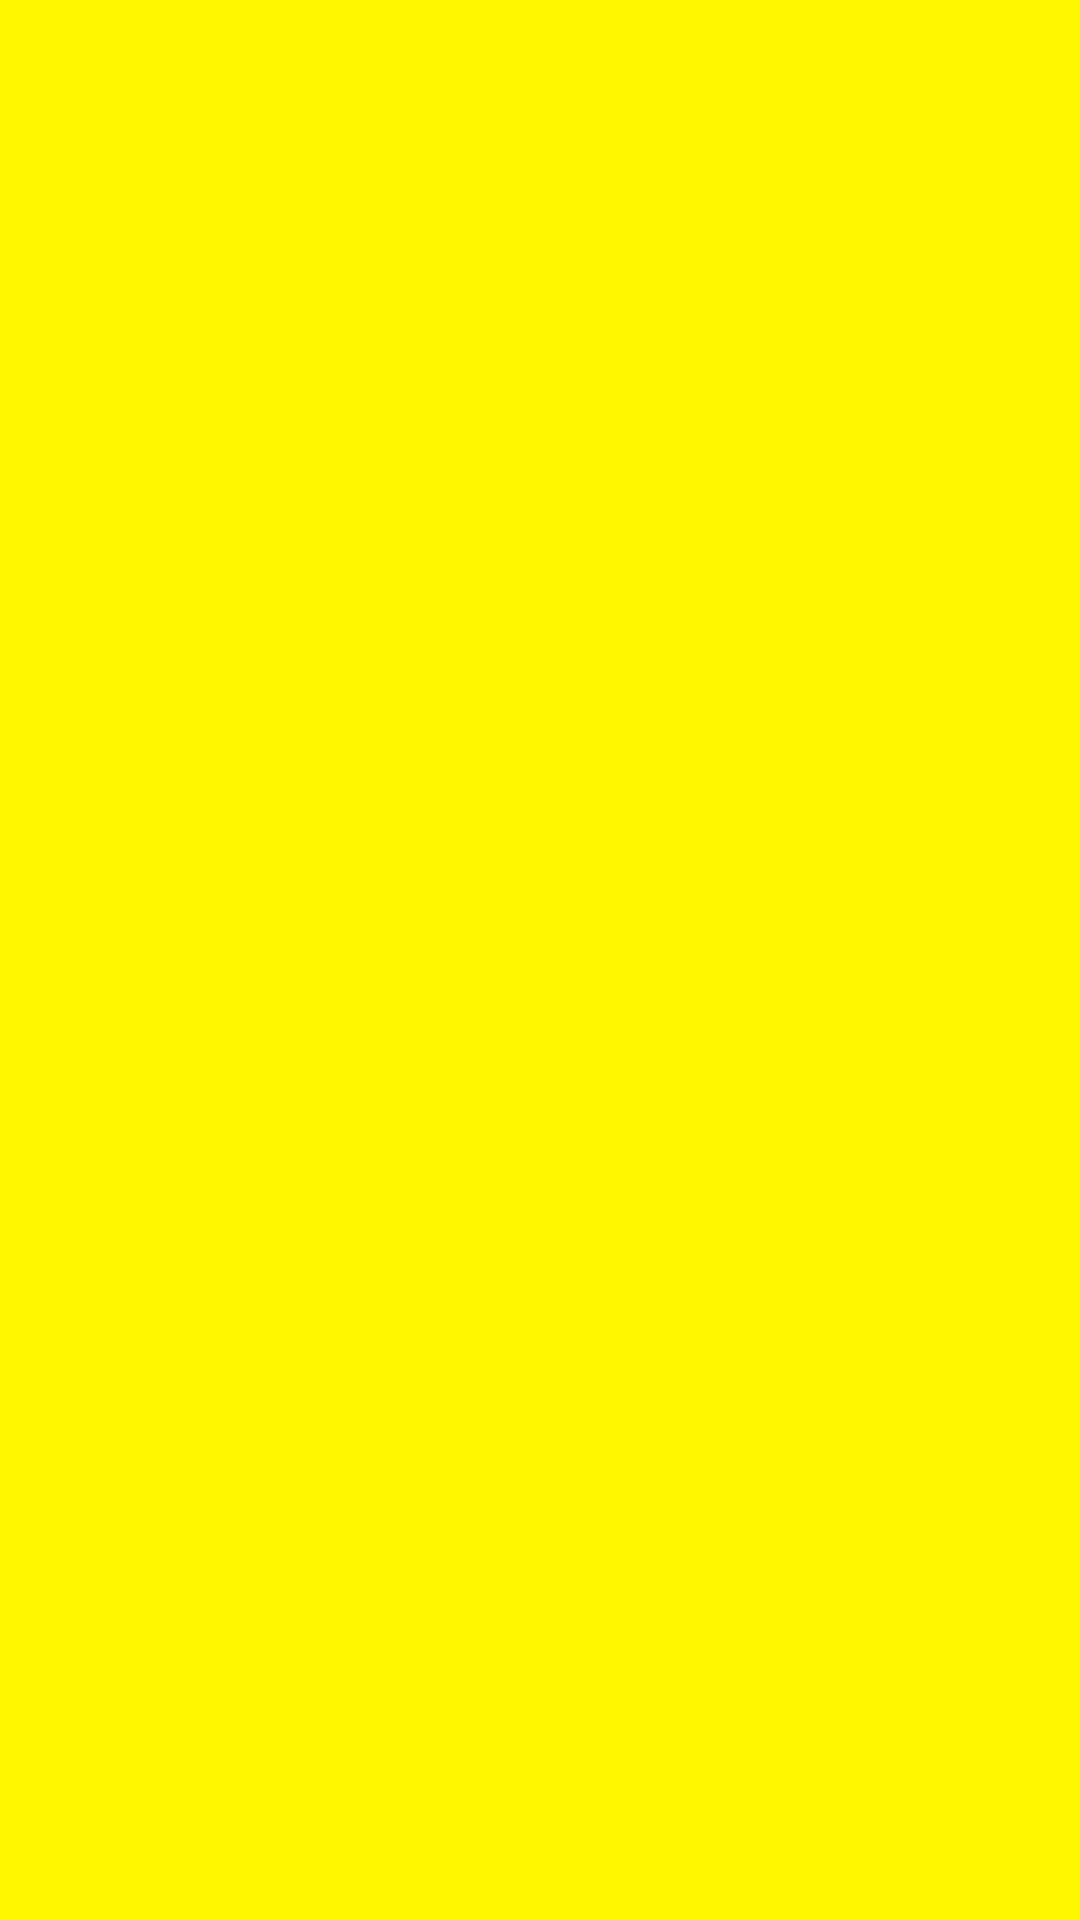 1080x1920 Lemon Solid Color Background